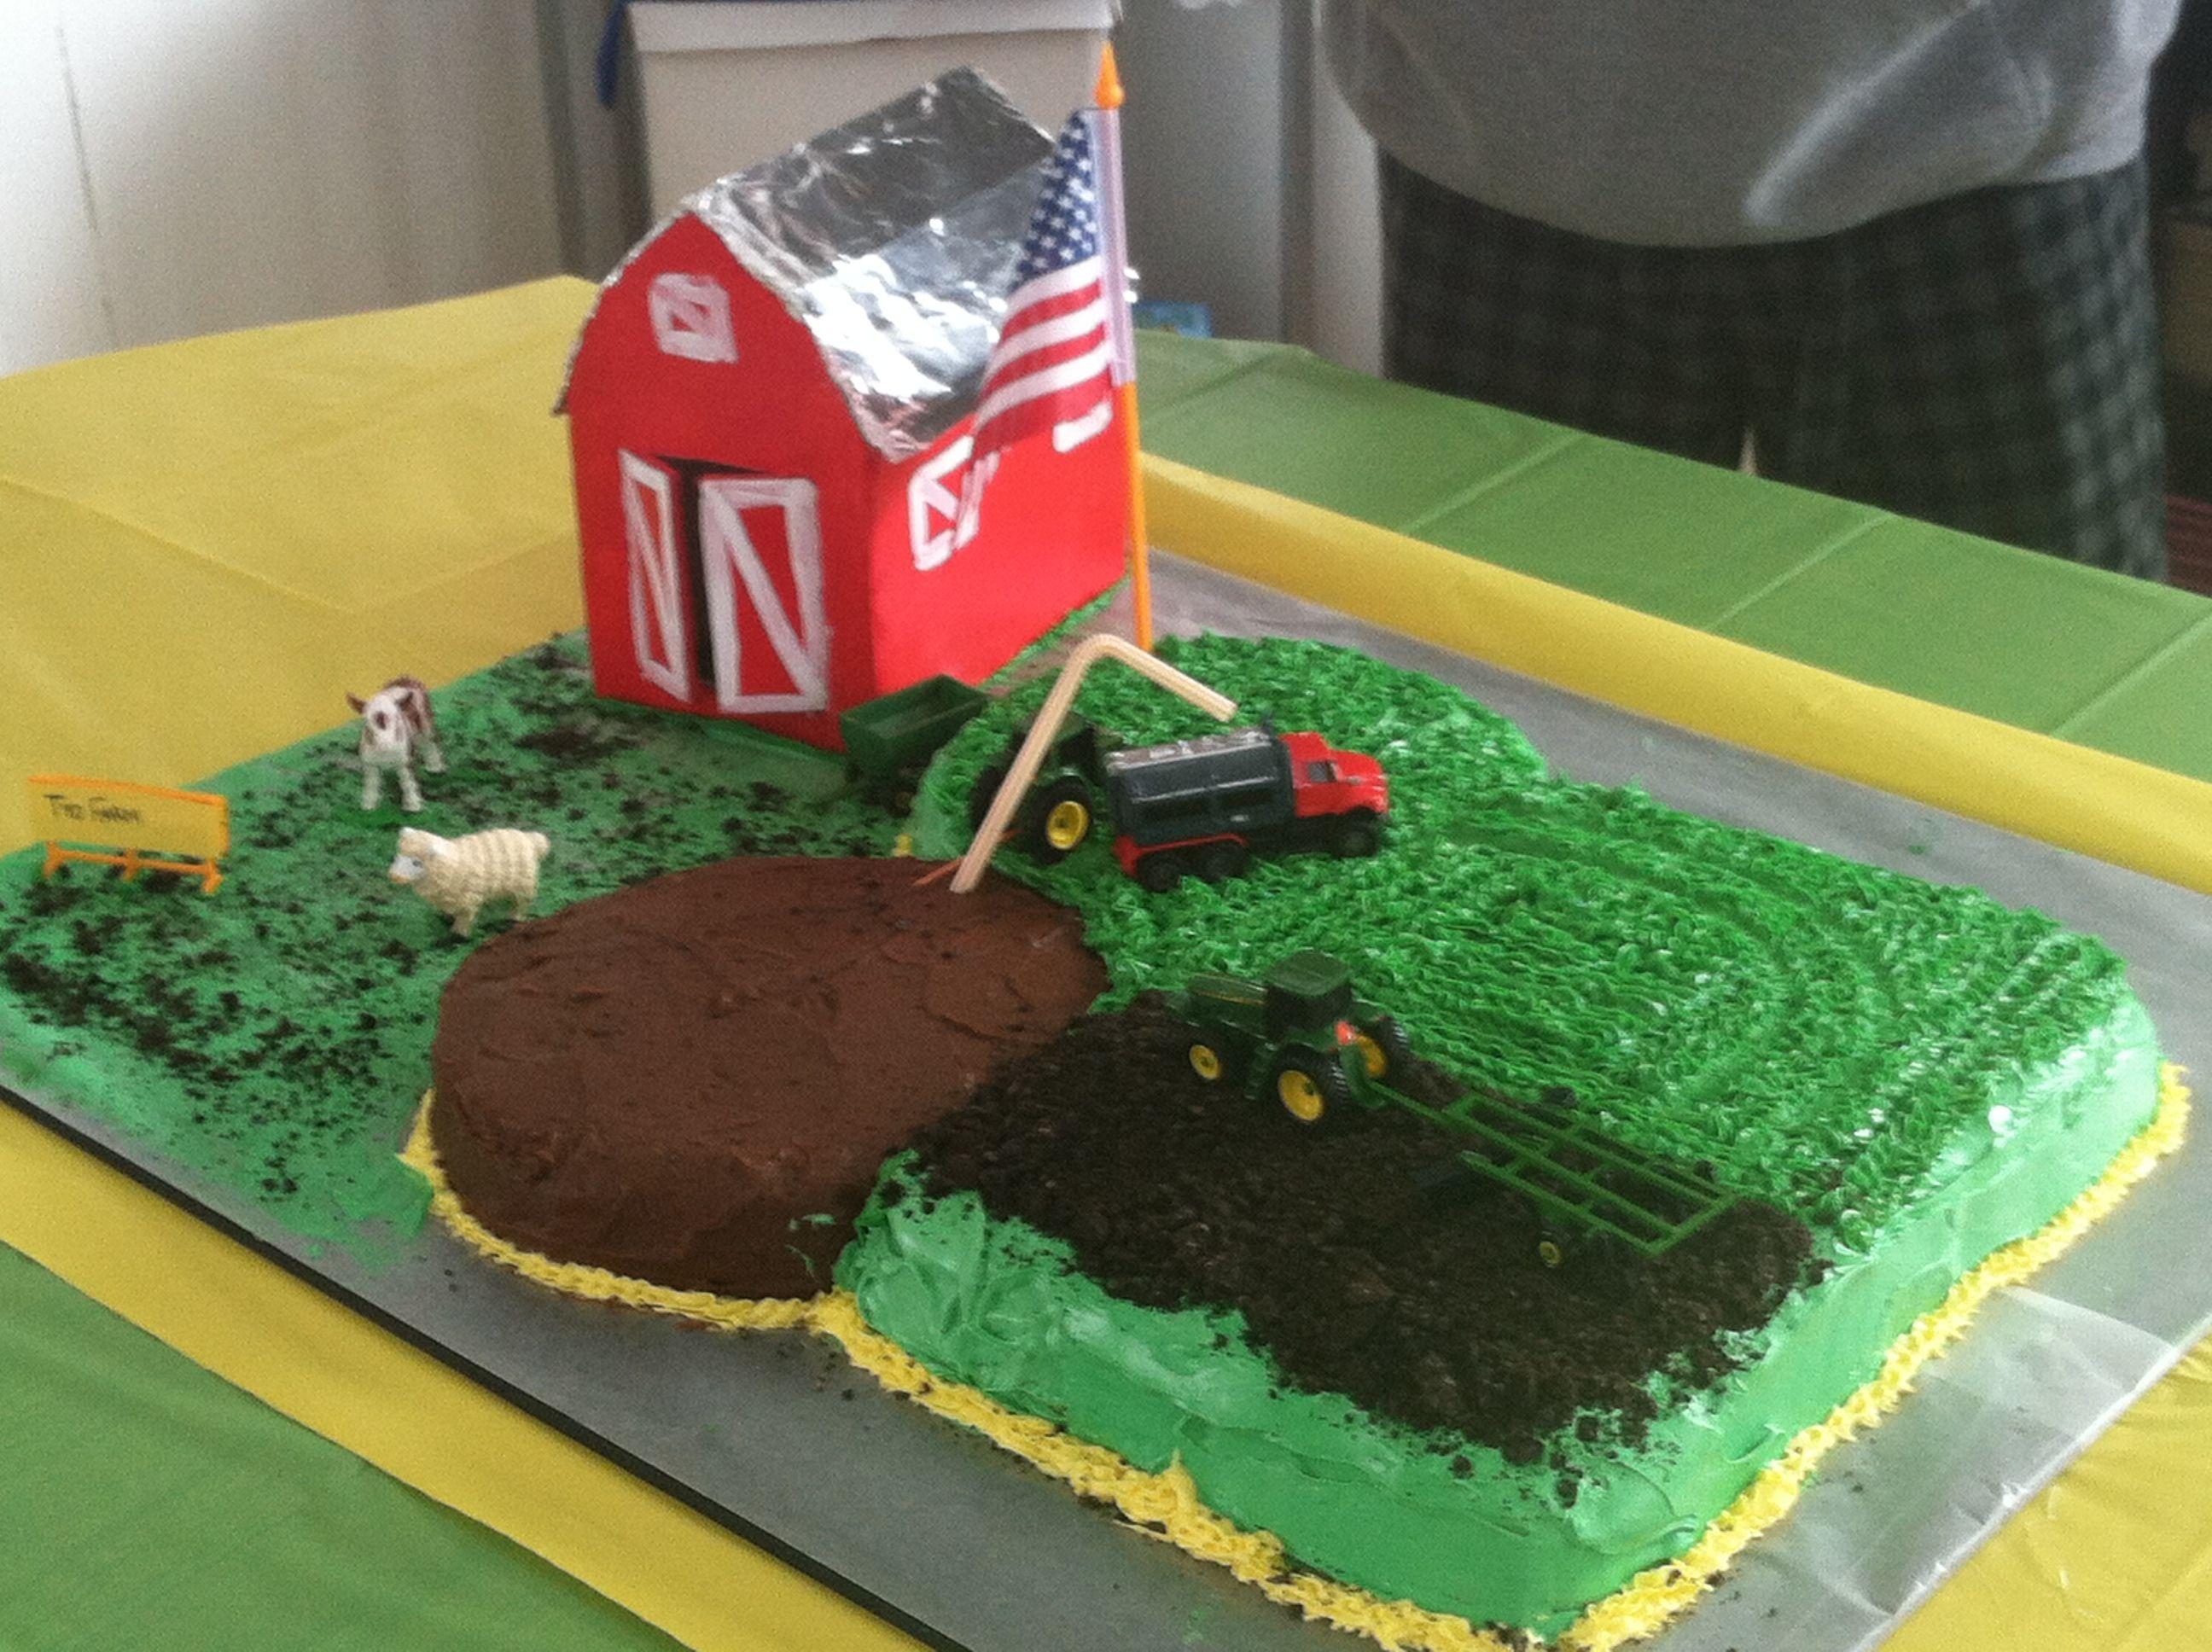 John Deere Farm cake with manure pit tanker hauling it to field